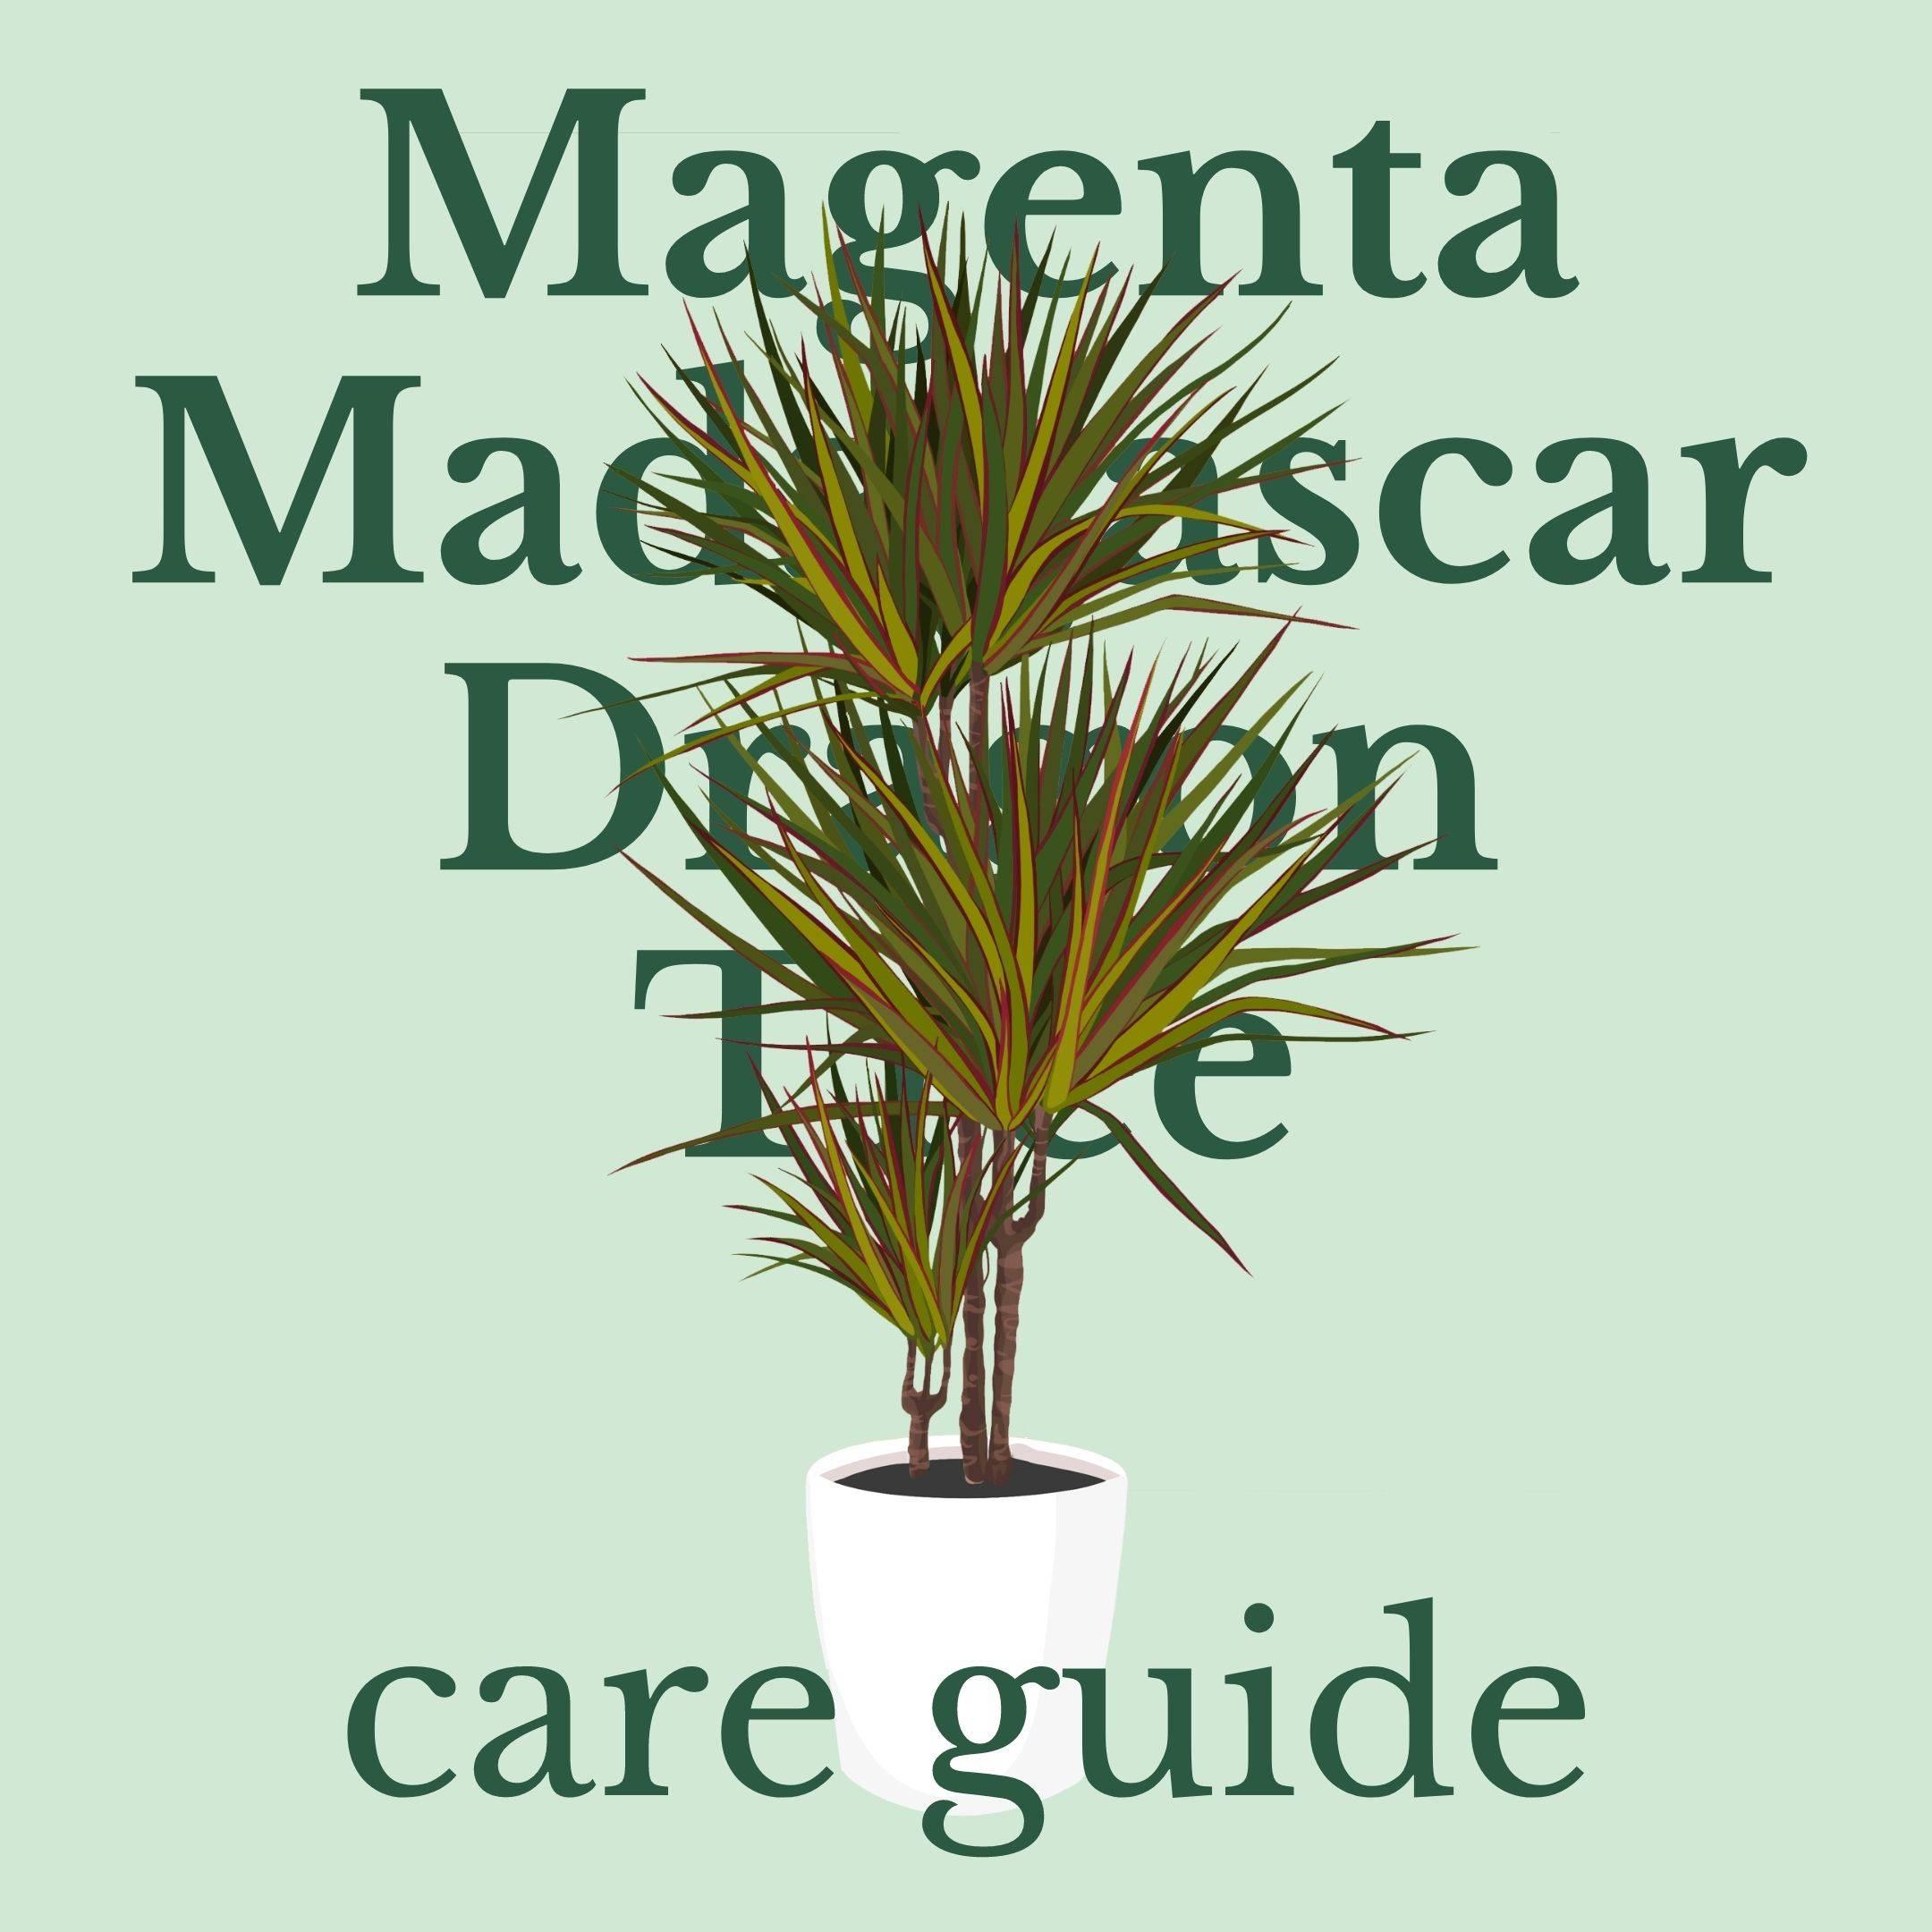 Drawing of magenta madagascar dragon tree